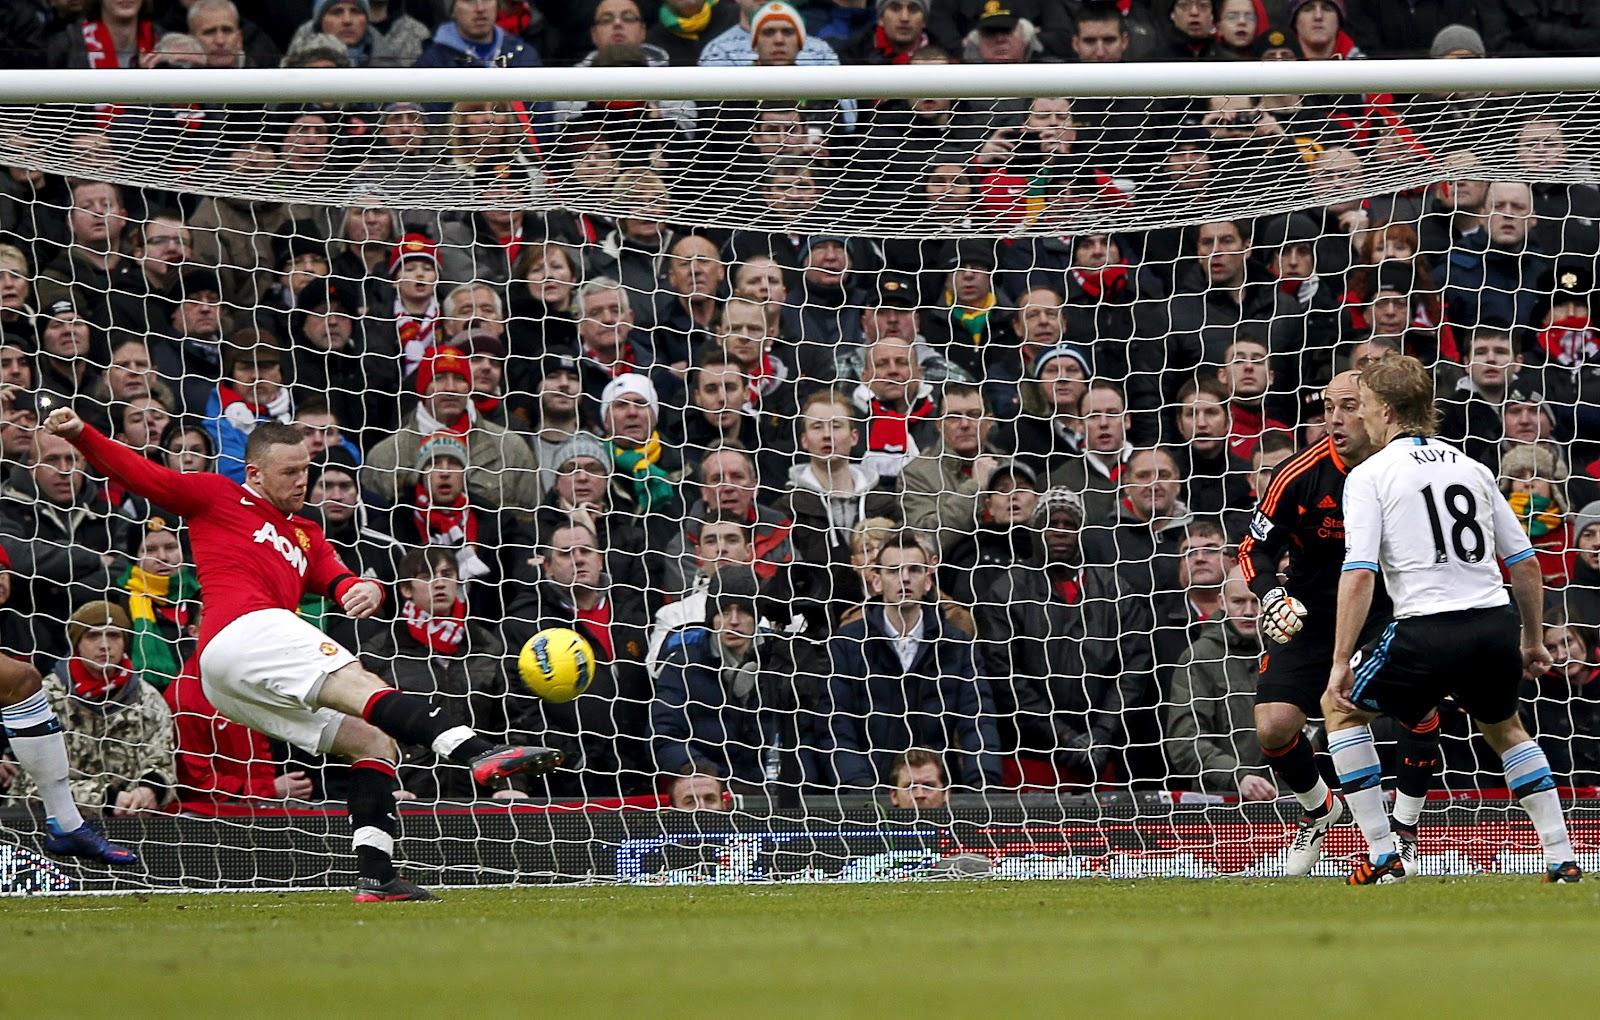 http://3.bp.blogspot.com/-MPsh4itP-MA/Tz70p9sx5uI/AAAAAAAABSc/4bRBaNCl71c/s1600/Manchester+United+vs+Liverpool+epl+feb+2012+Wayne+Rooney+volley+goal.jpg